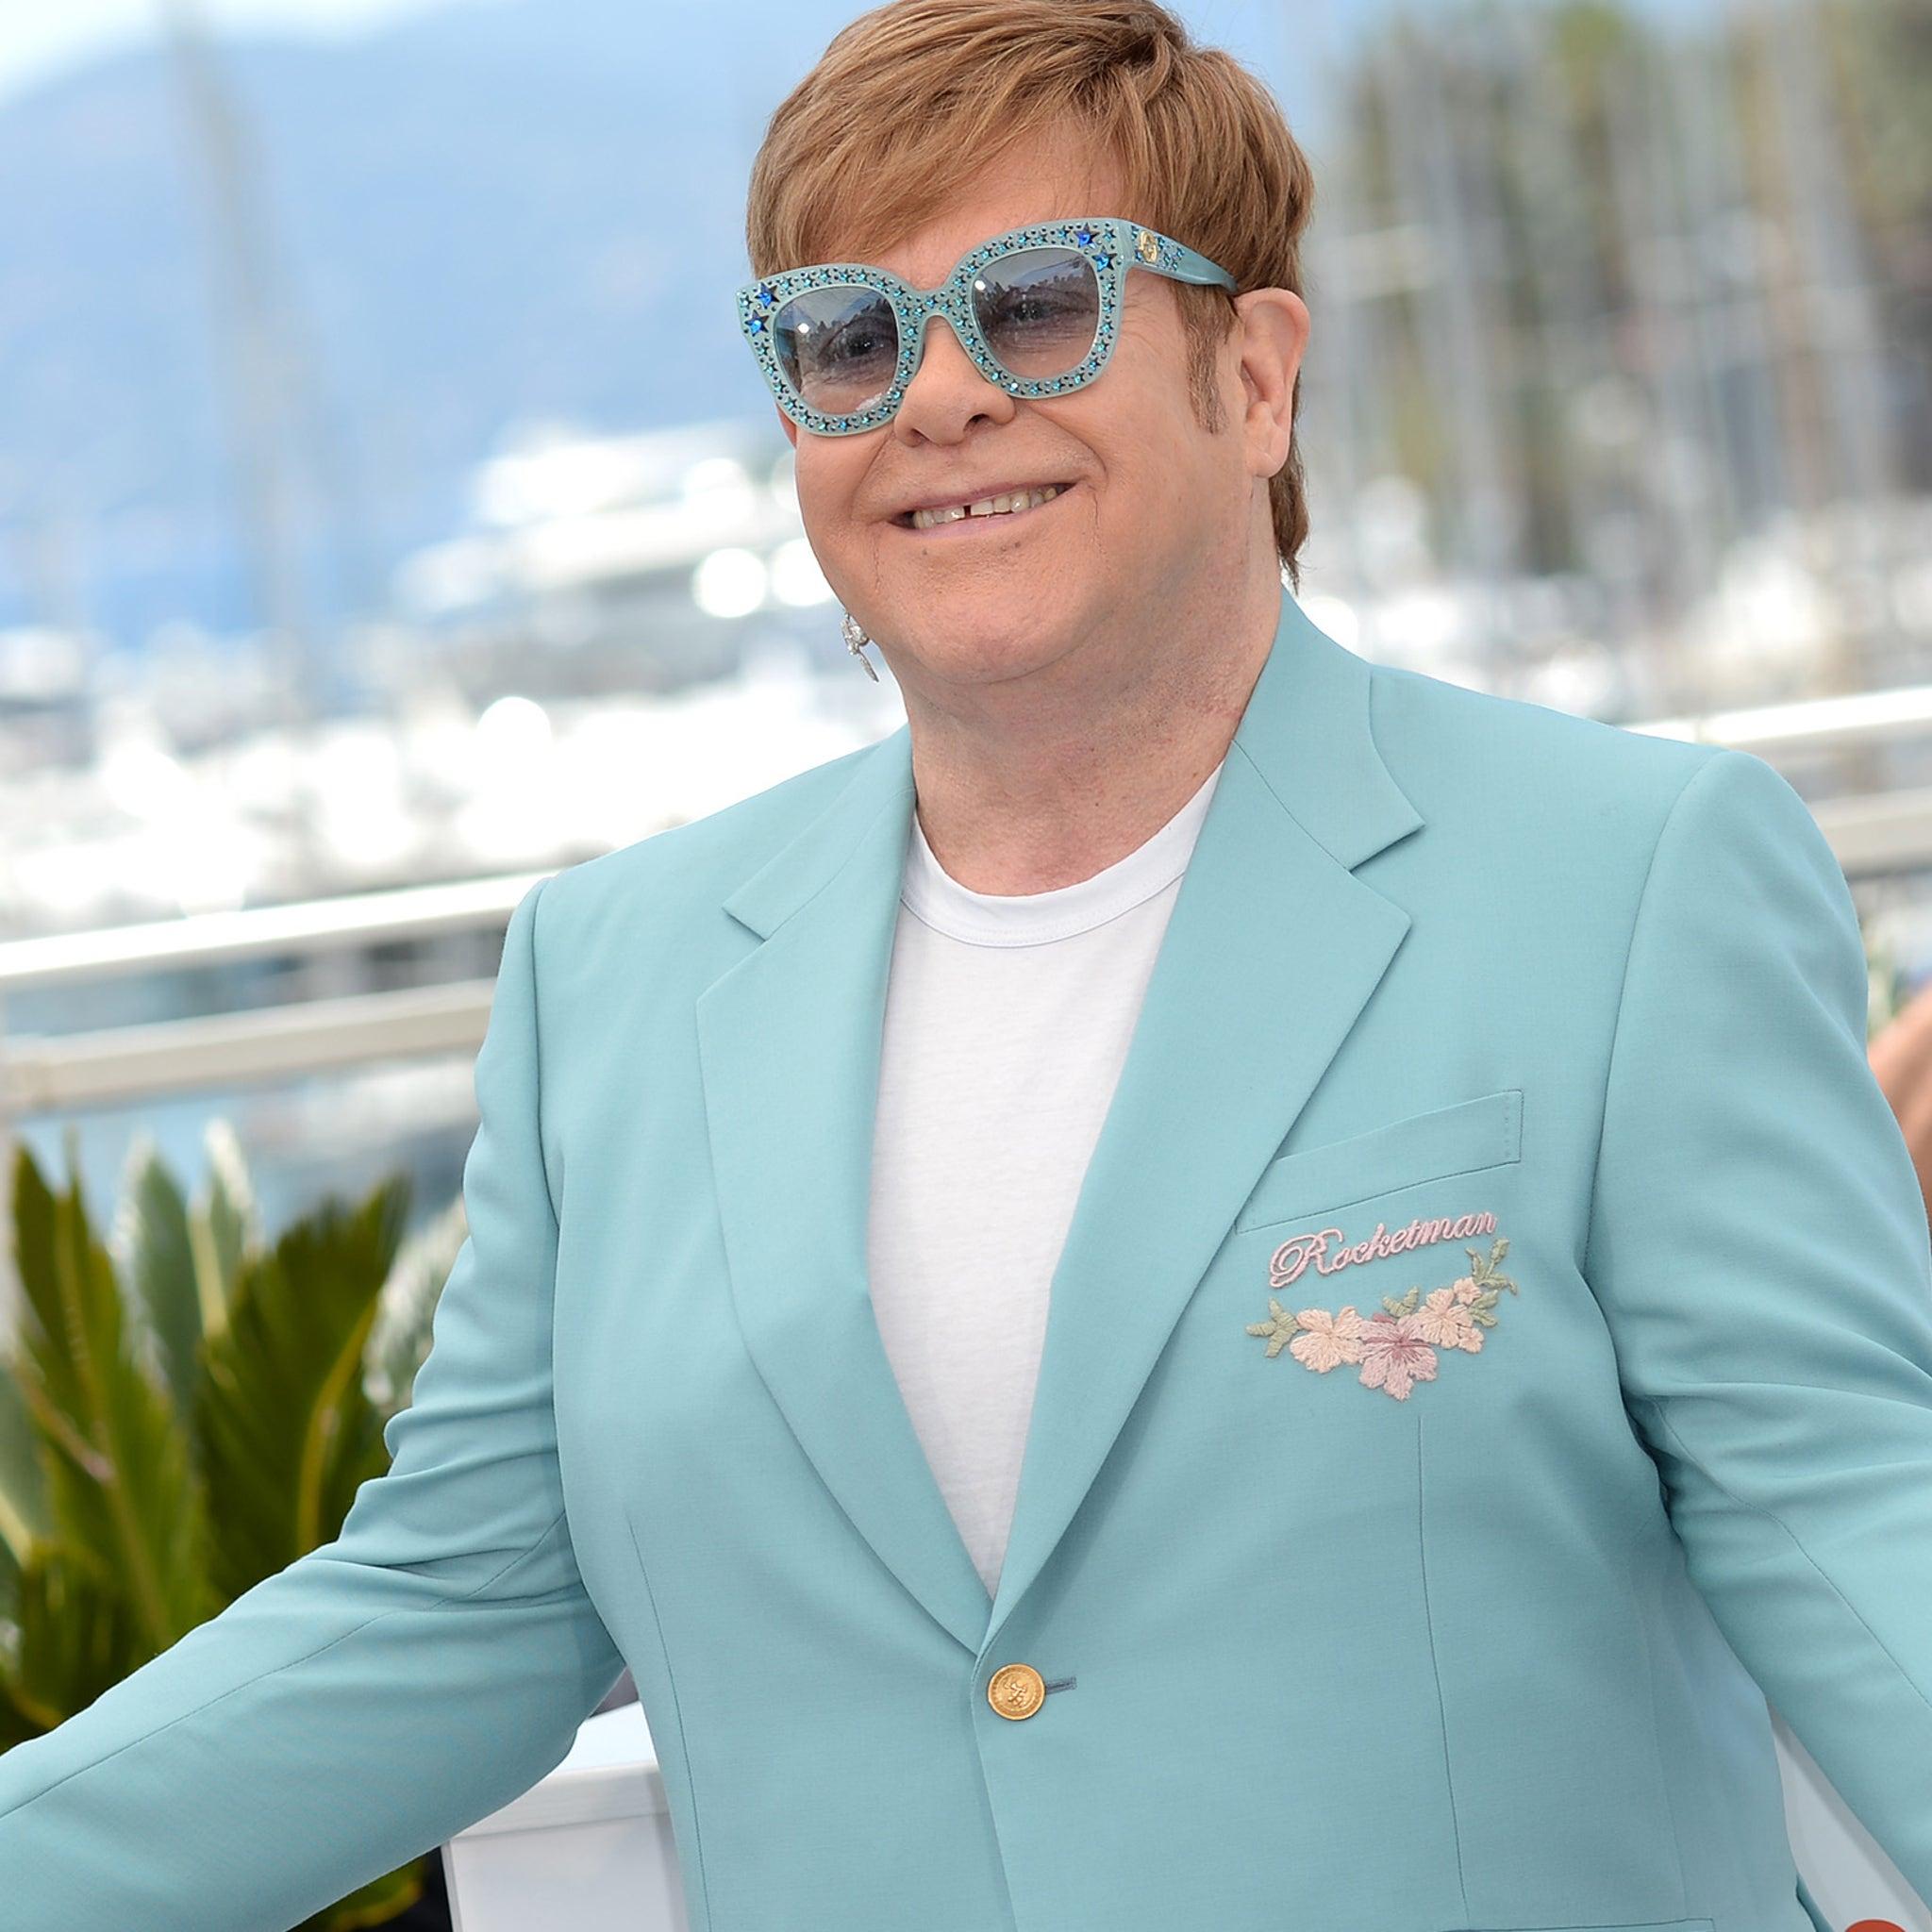 Elton John S Brother Claims Rocketman Rewrites Family History